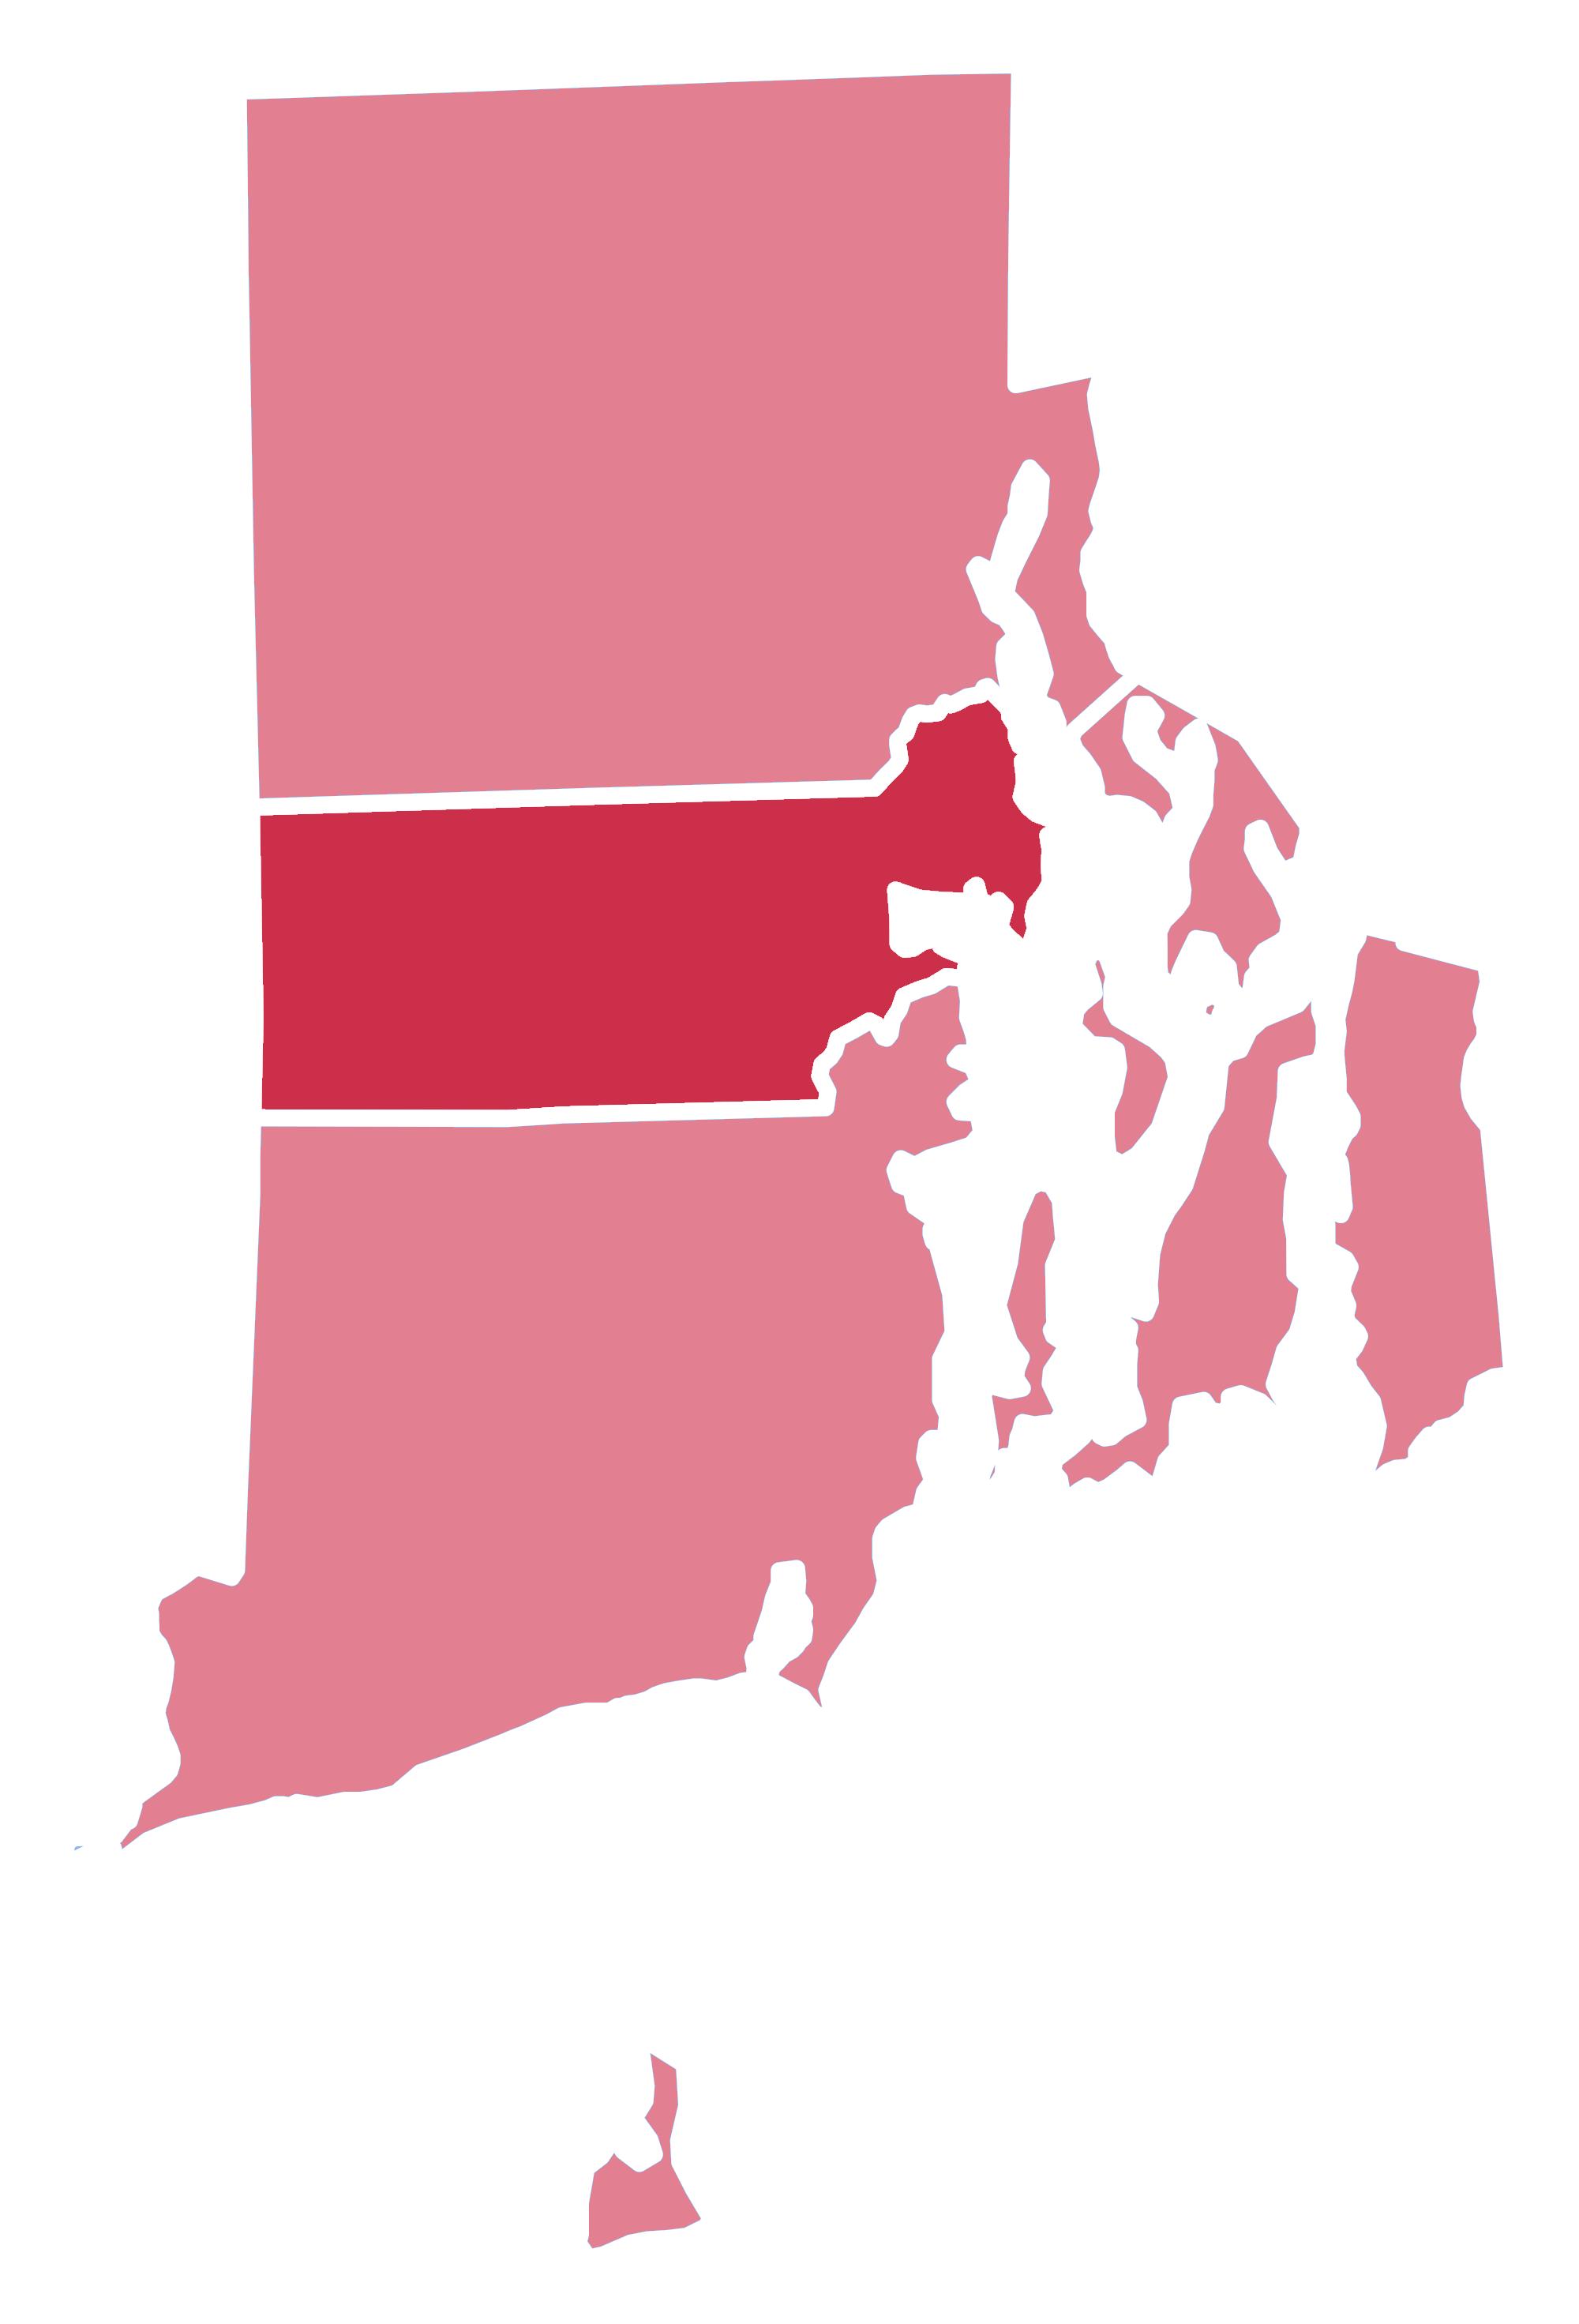 Rhode_Island_Presidential_Election_Results_2016_Republican_Landslide_15.06%.png